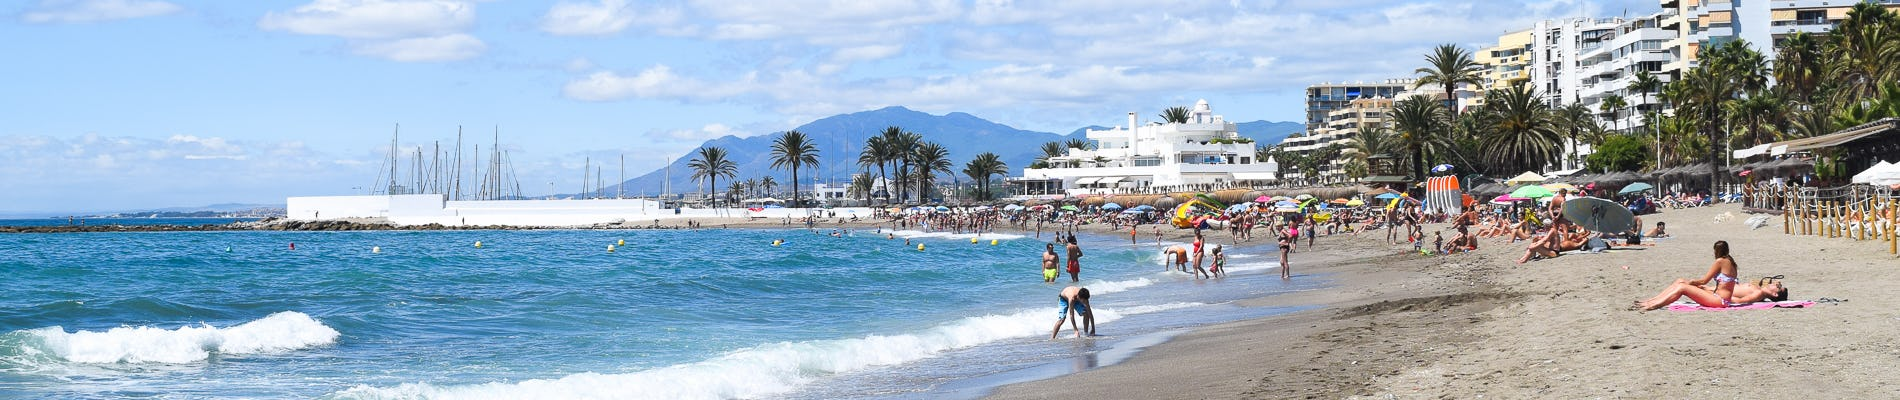 Playa De La Venus A Sandy Beach In The City Centre With Long Promenade